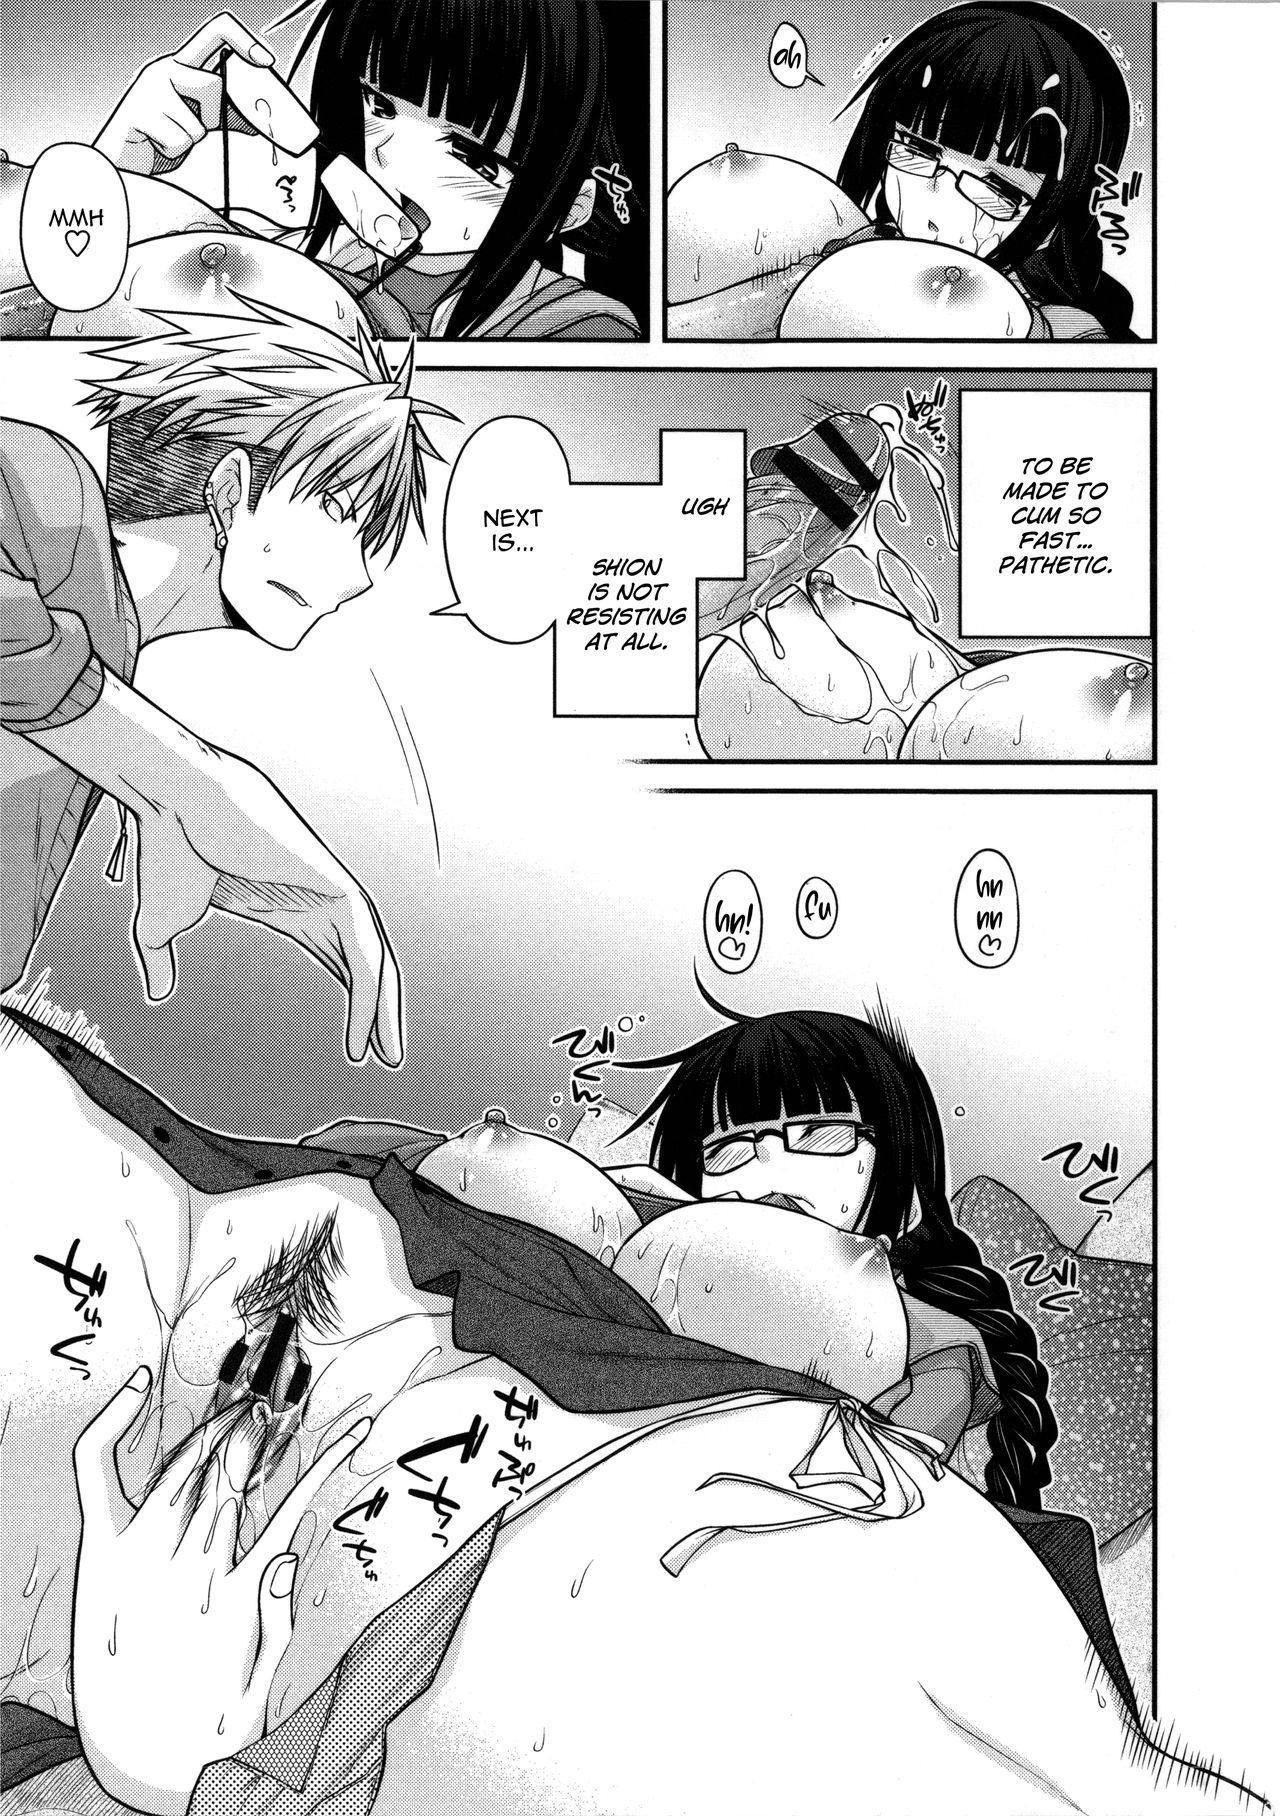 [Miyashiro Sousuke] Yamato Nadeshiko Chichi Henge - Yamato Nadeshiko Breast Changes Ch. 0-1, 4, 7-9 [English] 33